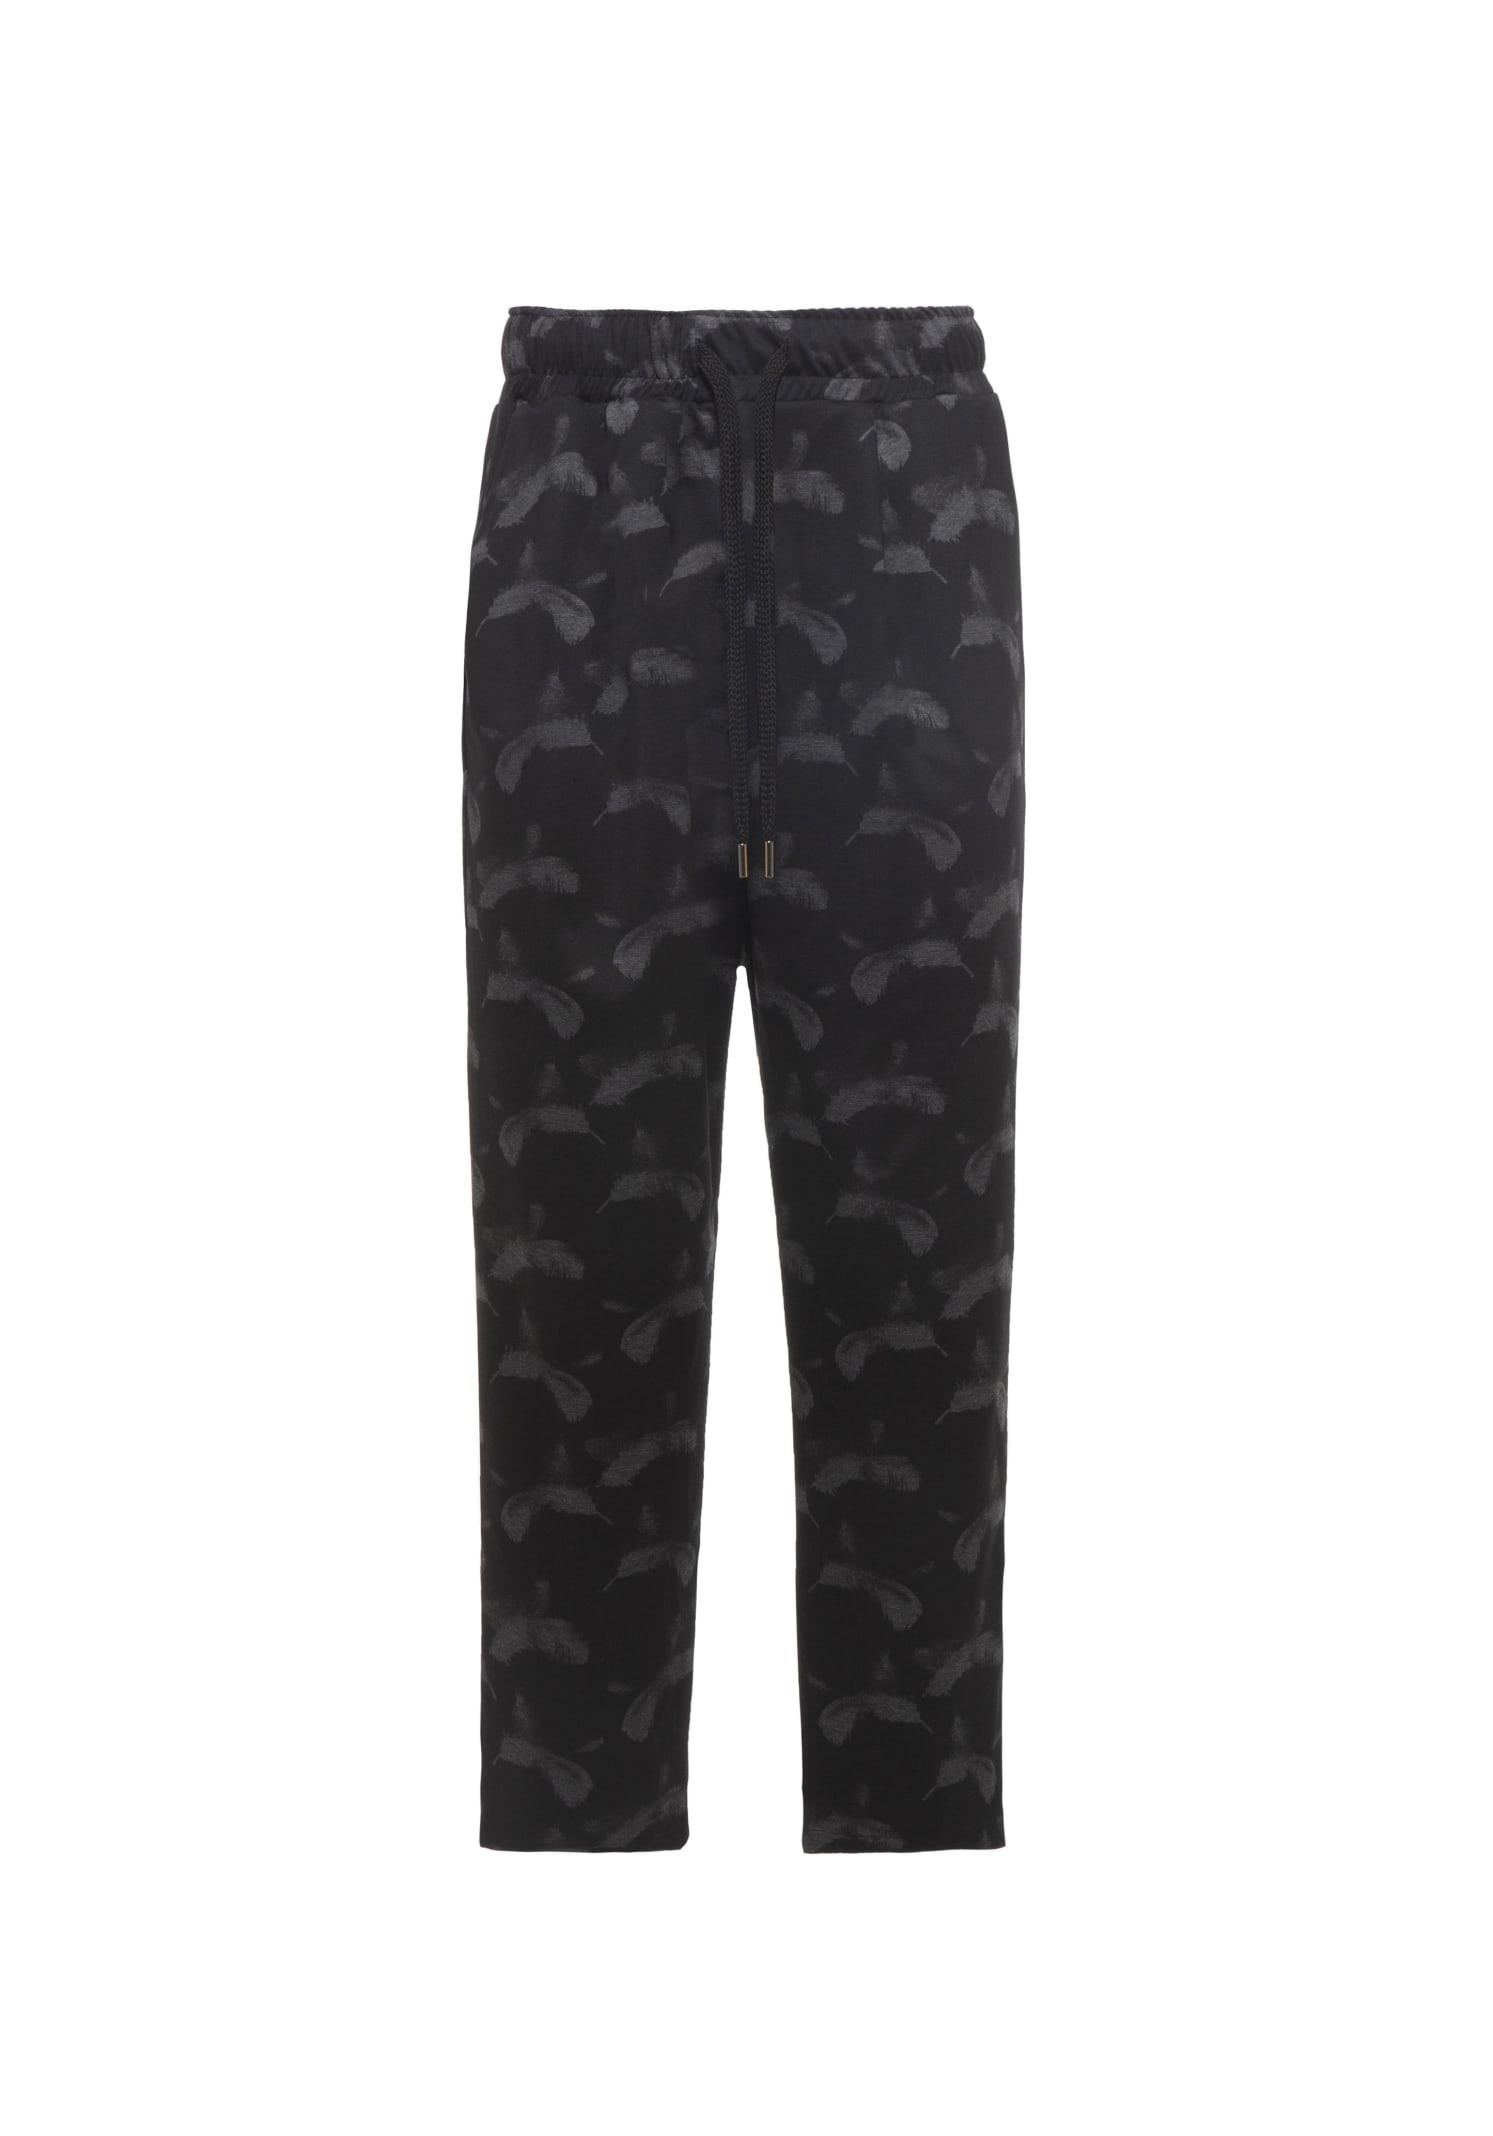 Pants Chino Plume Black